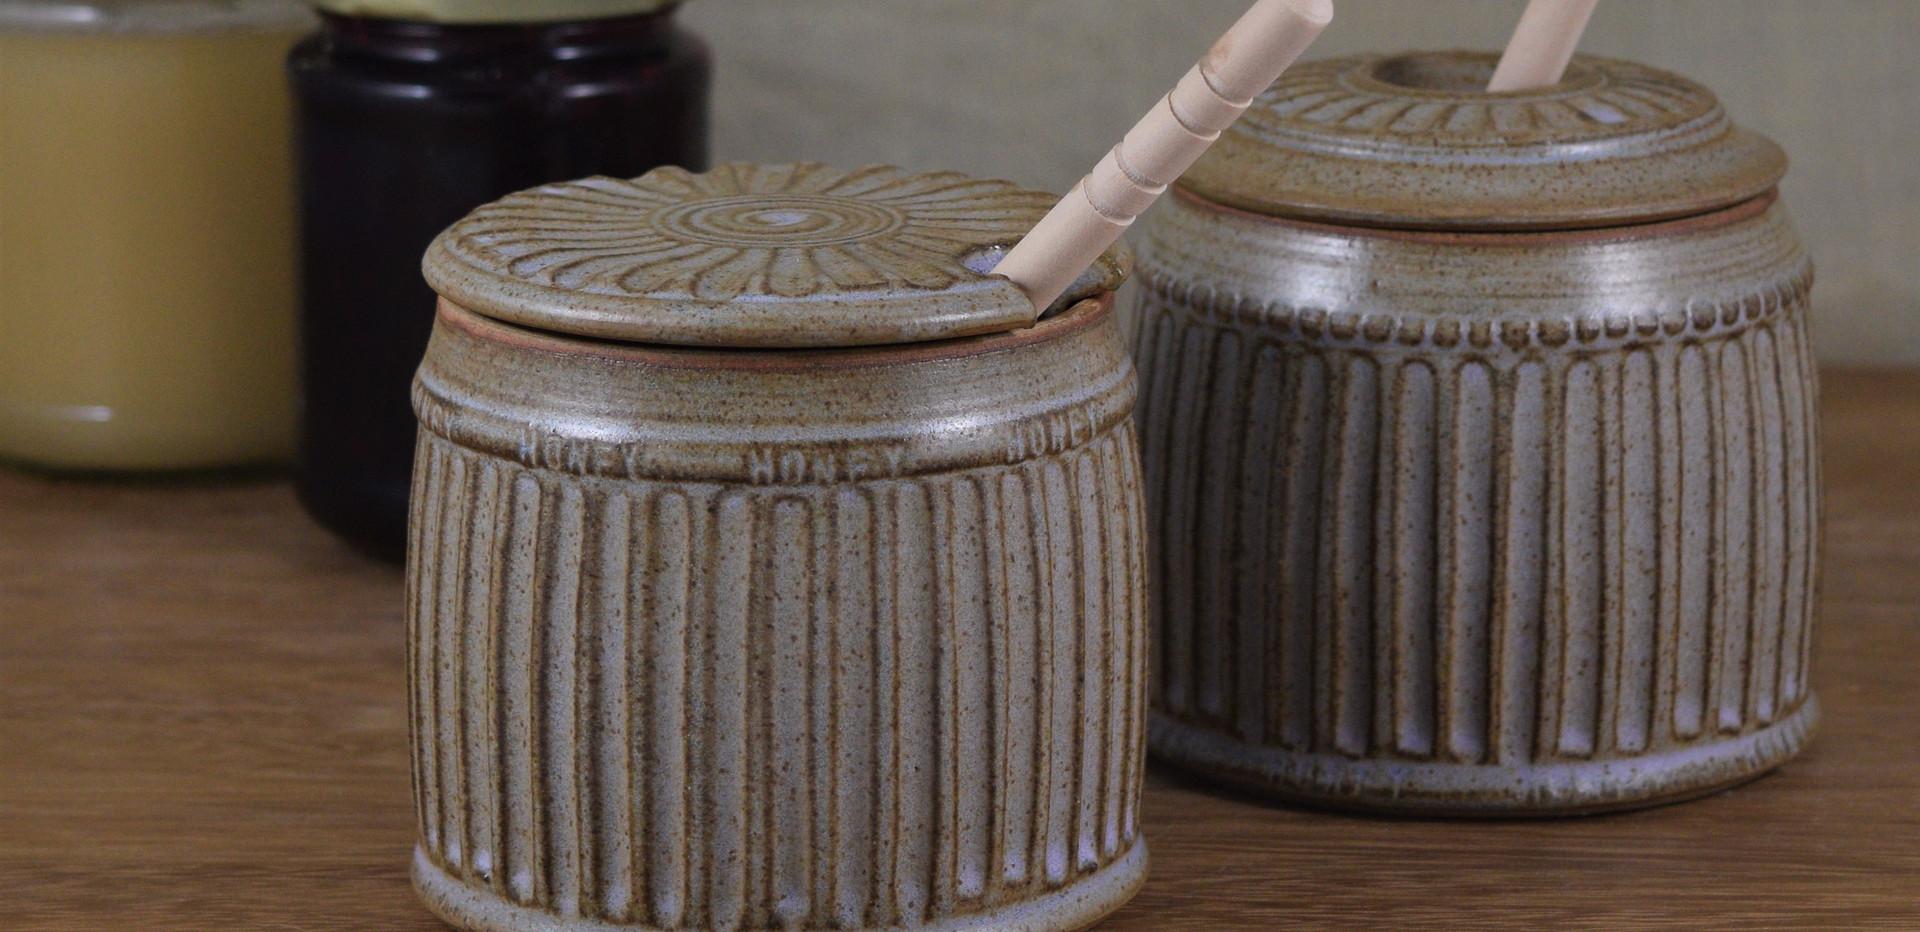 Honey Pots, two designs